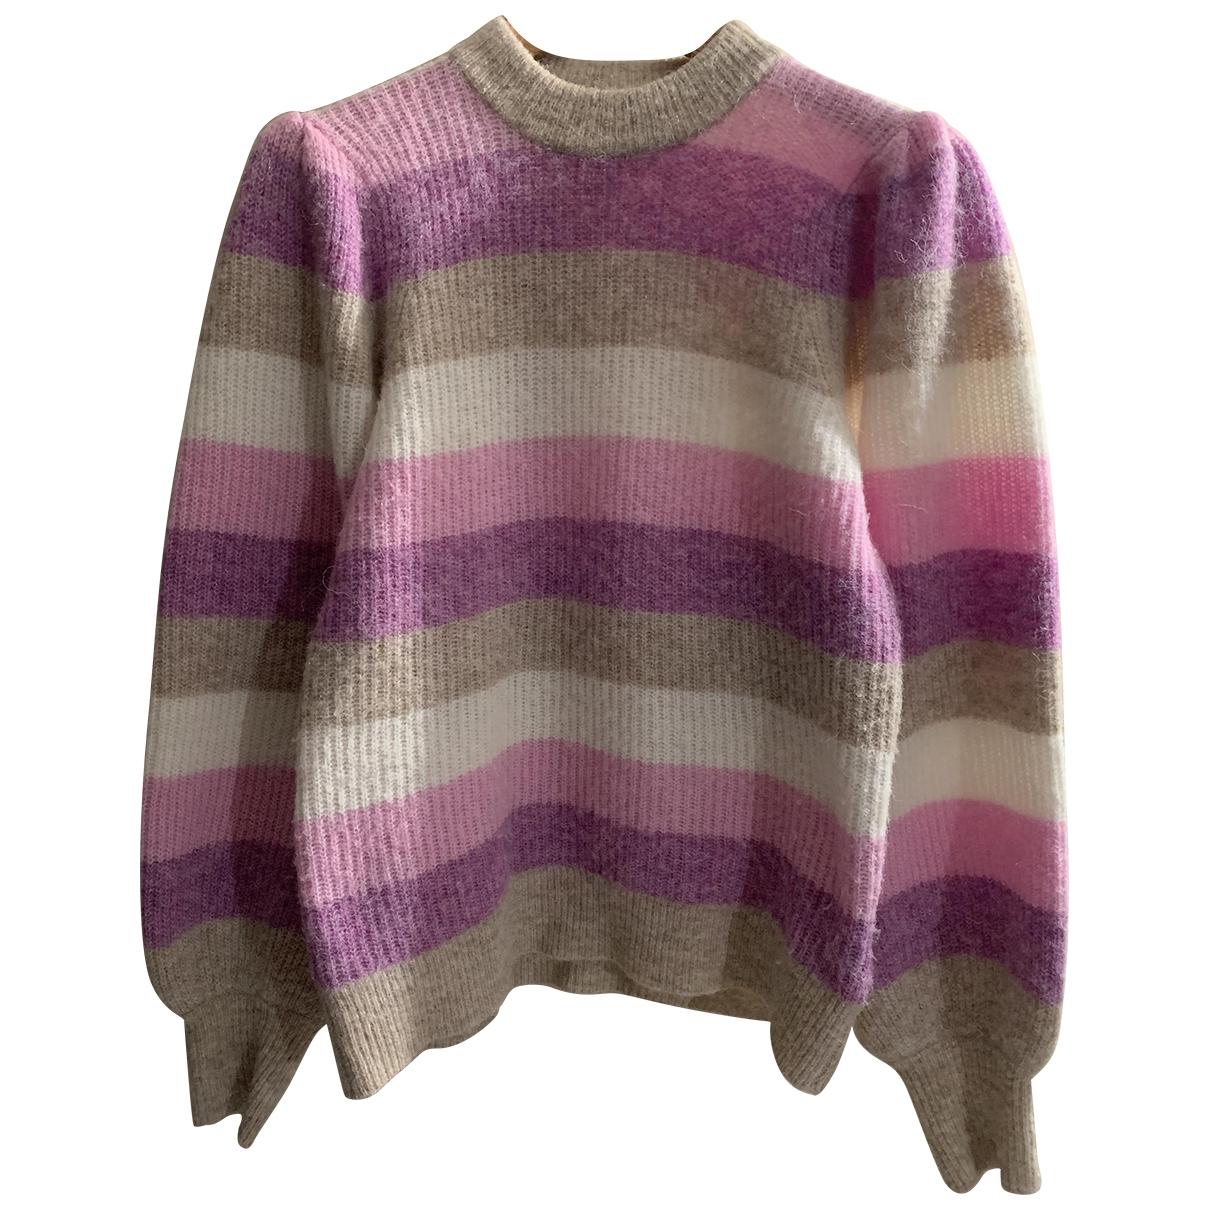 Ganni Spring Summer 2020 Multicolour Wool Knitwear for Women S International